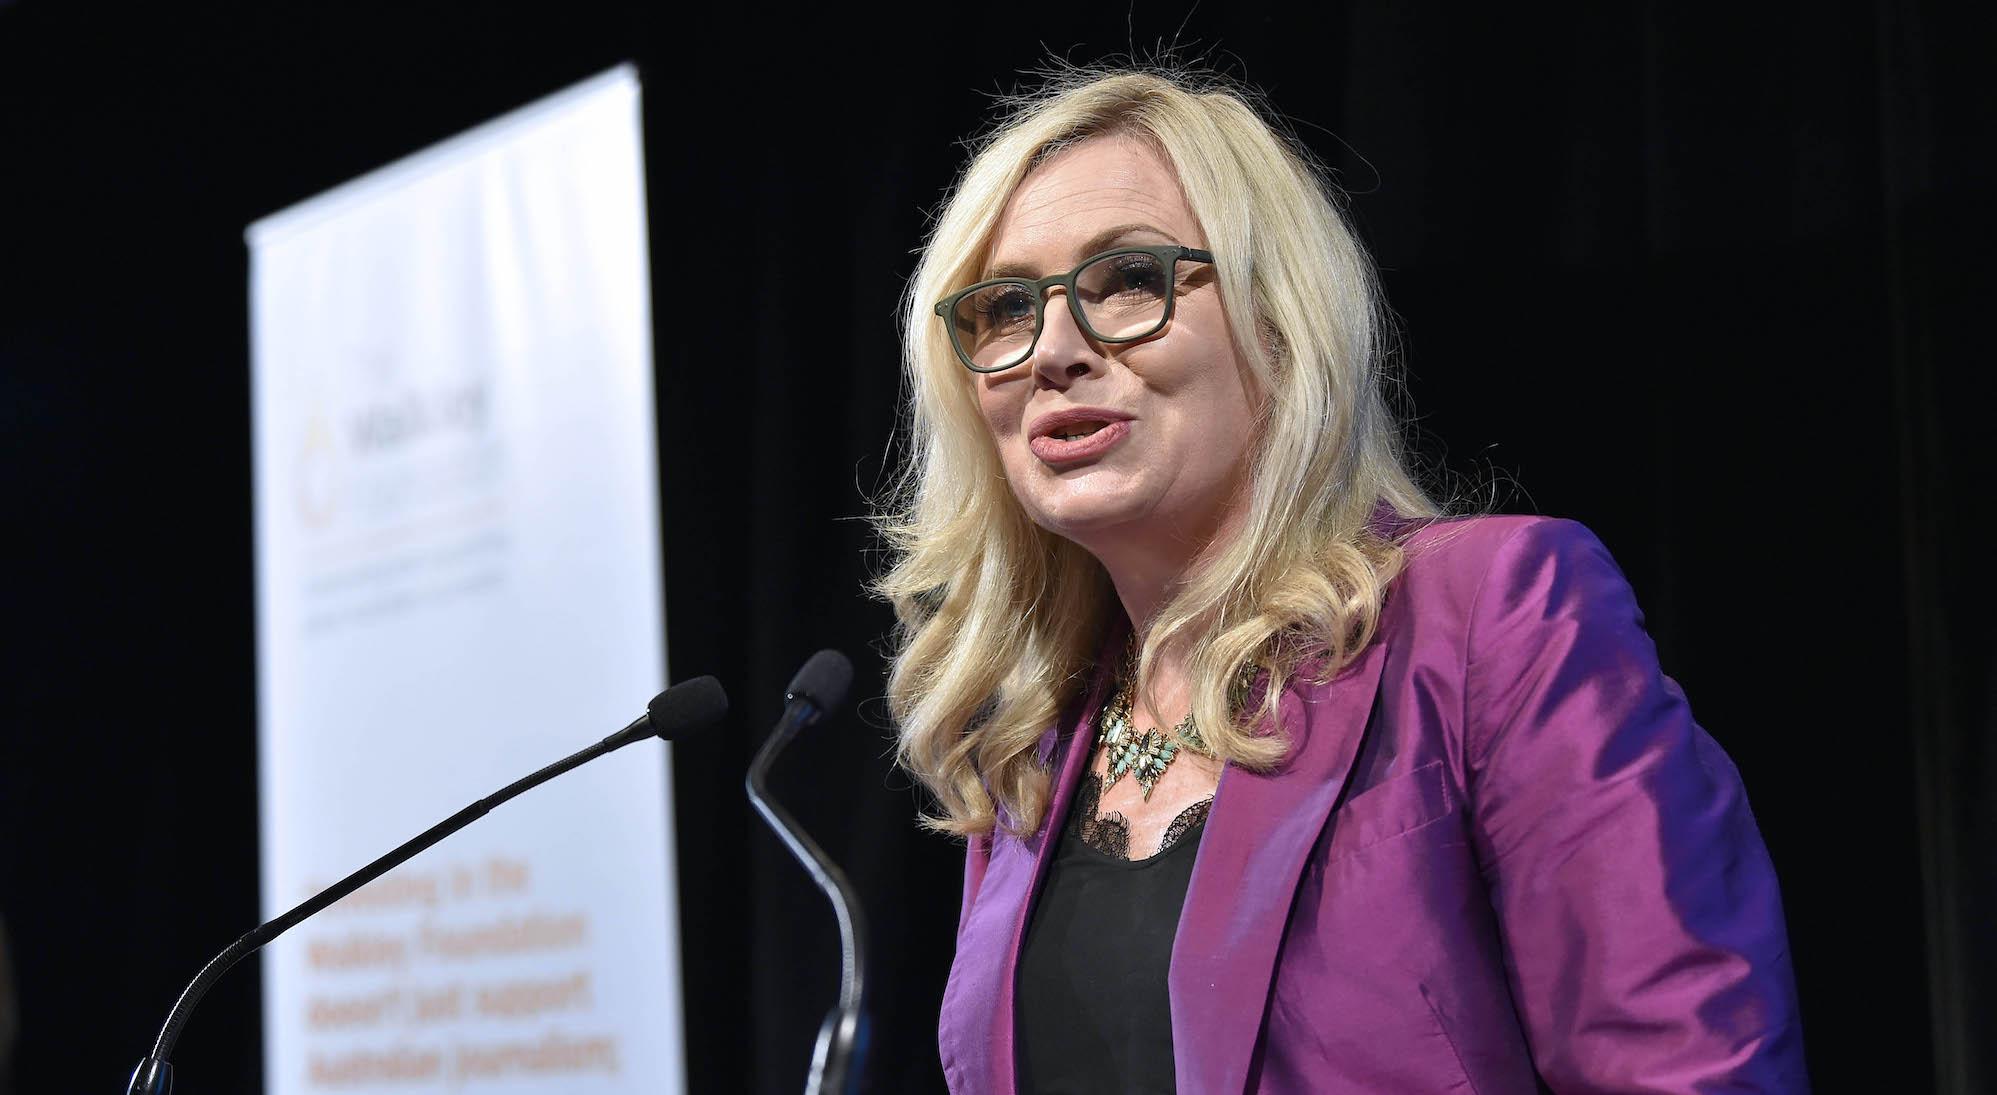 Walkley Foundation announces leadership changes